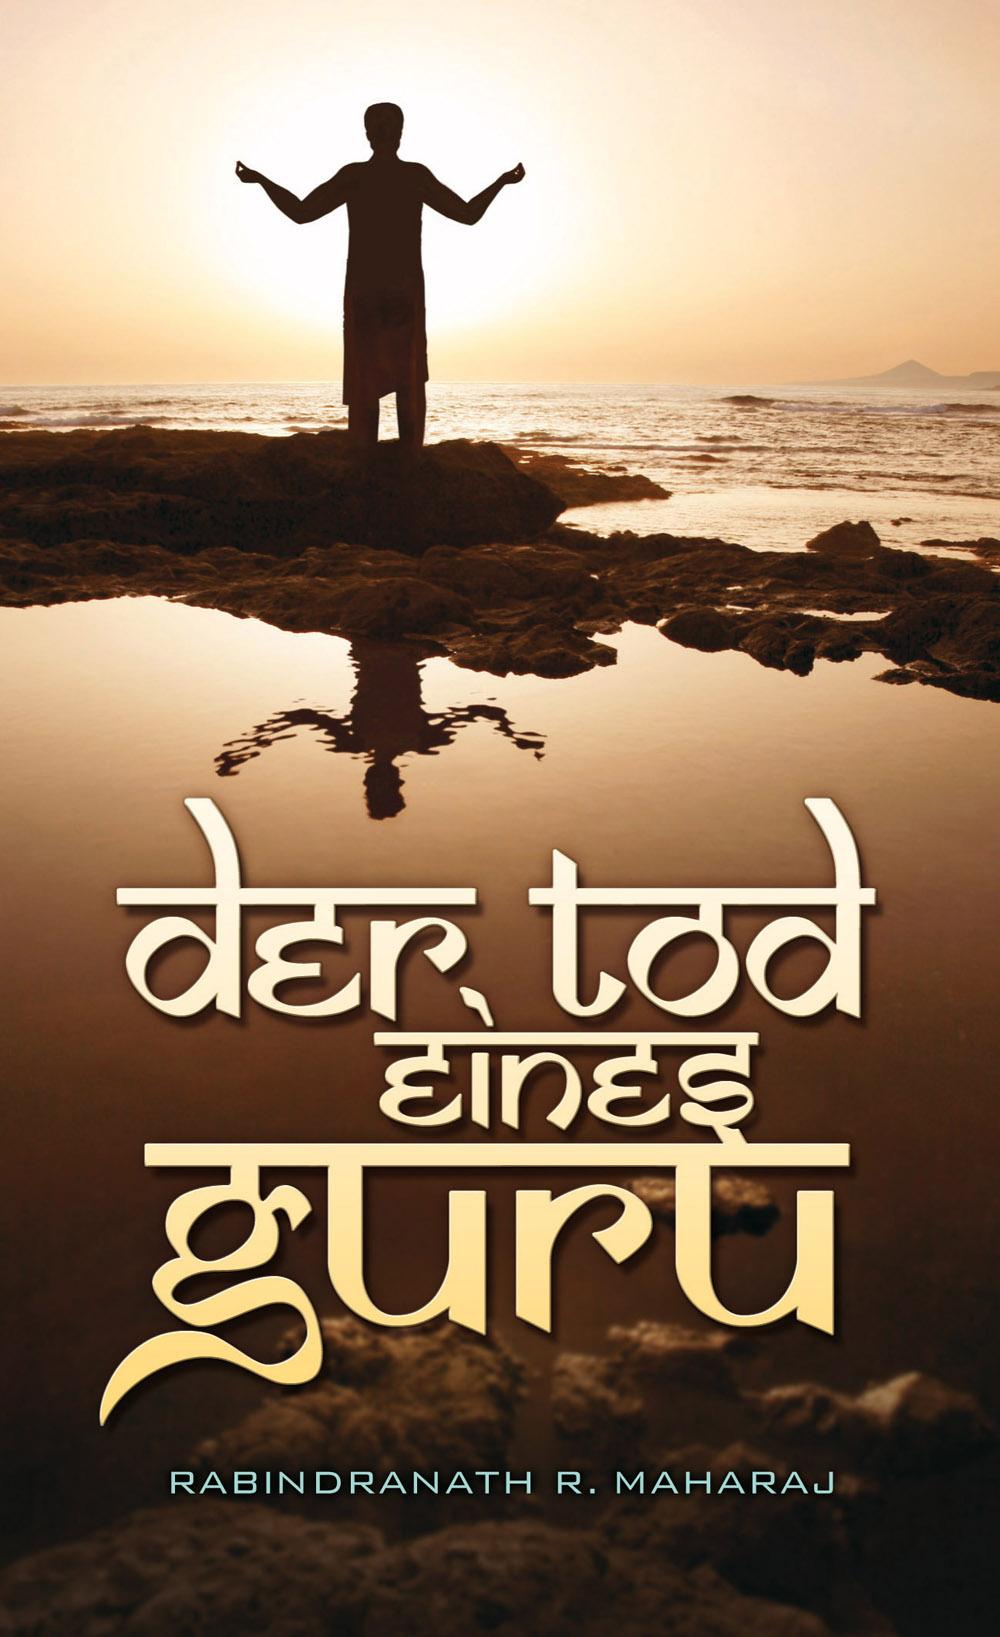 CLV_der-tod-eines-guru_rabindranath-r-maharaj_255414_1